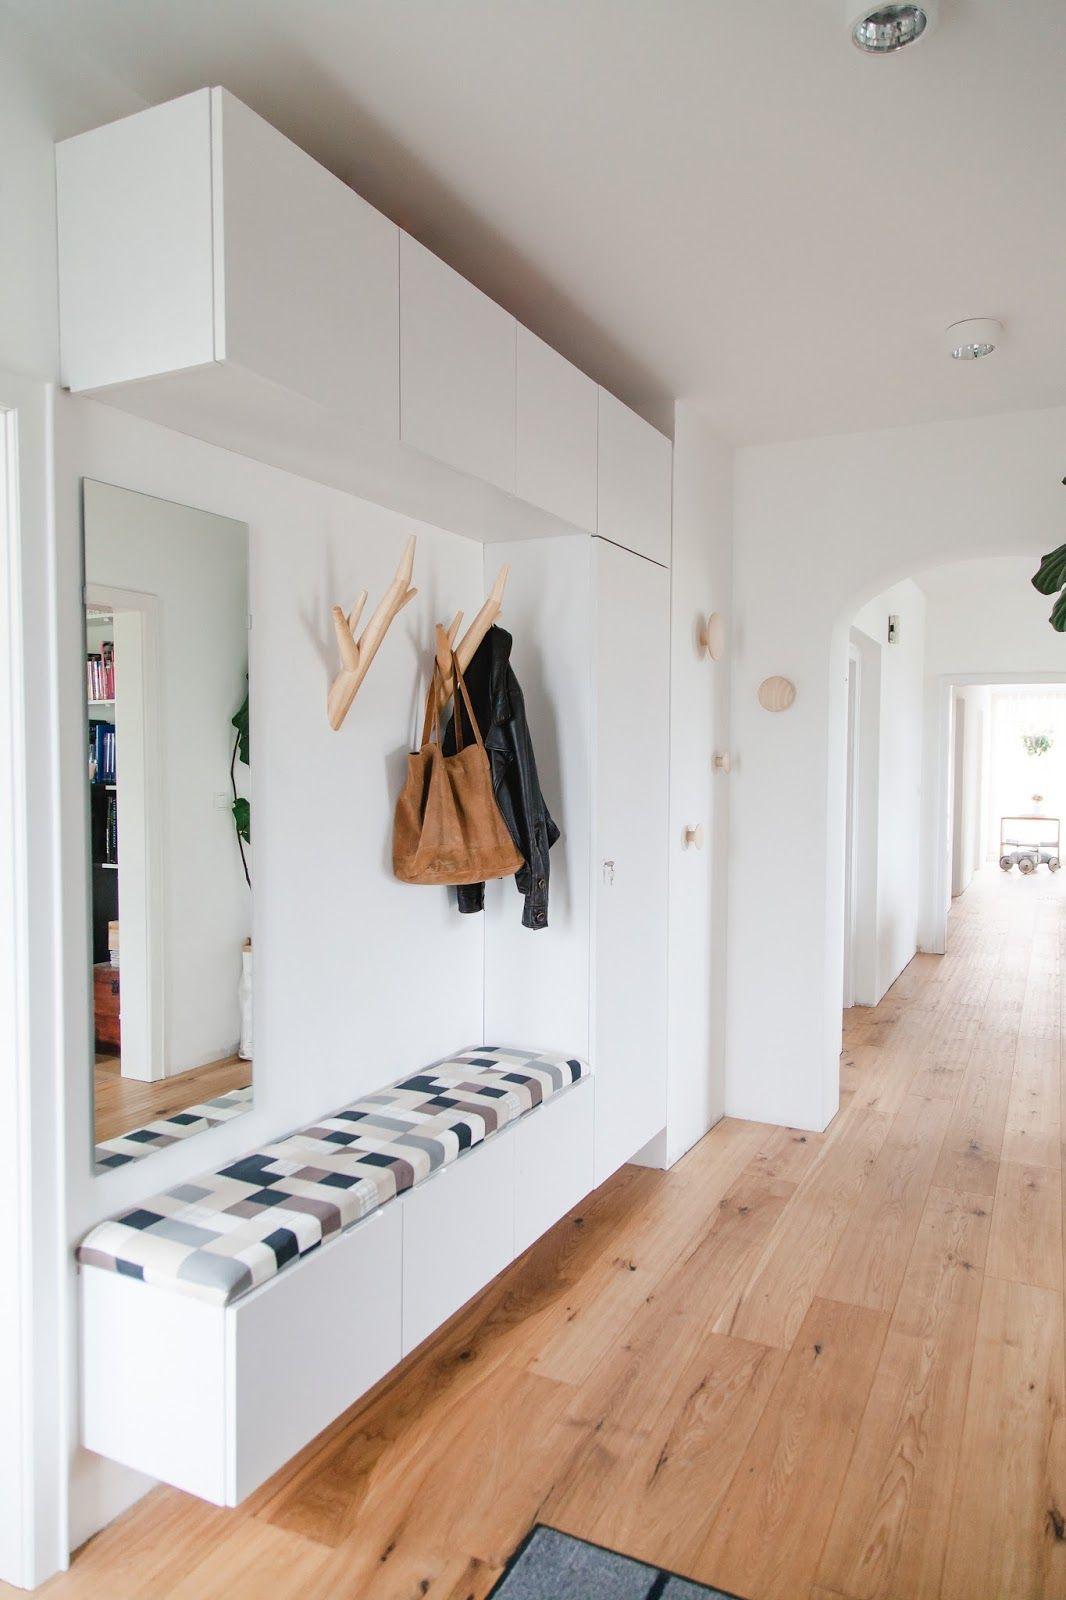 wohn projekt der mama tochter blog f r interior diy dekoration und kreatives vorher. Black Bedroom Furniture Sets. Home Design Ideas